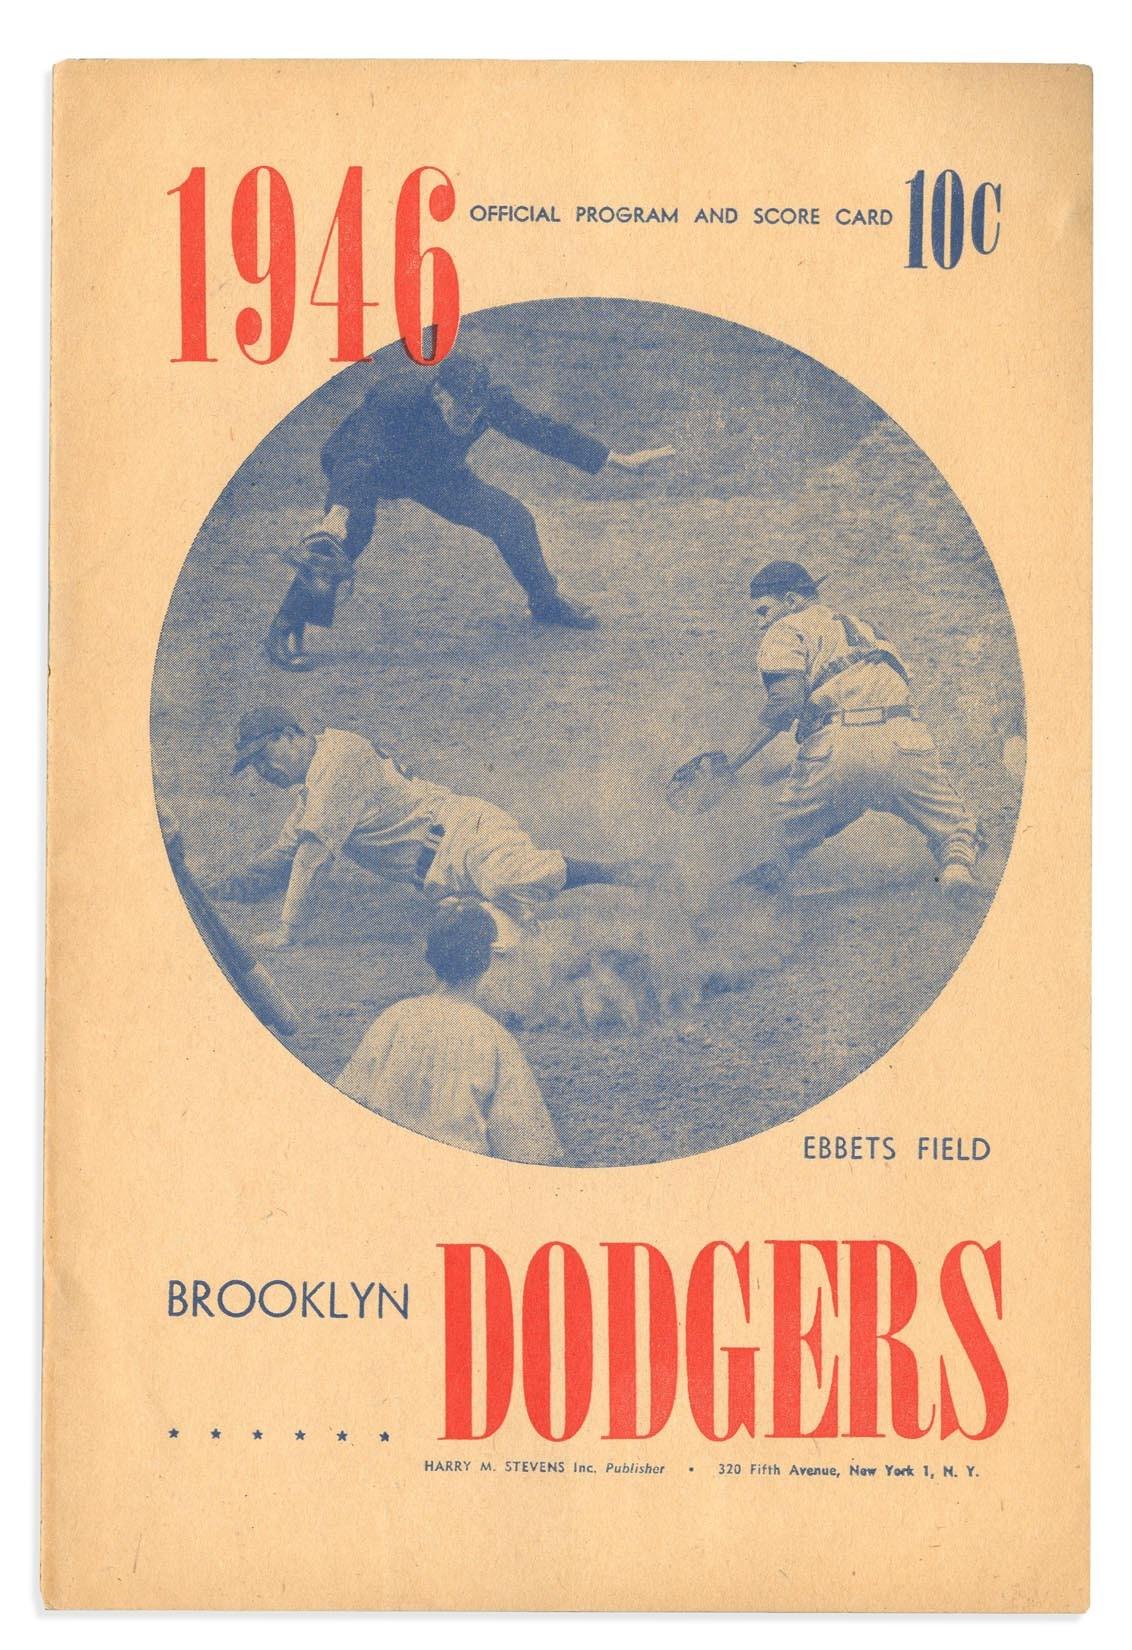 Jackie Robinson & Brooklyn Dodgers - 2018 Invitational